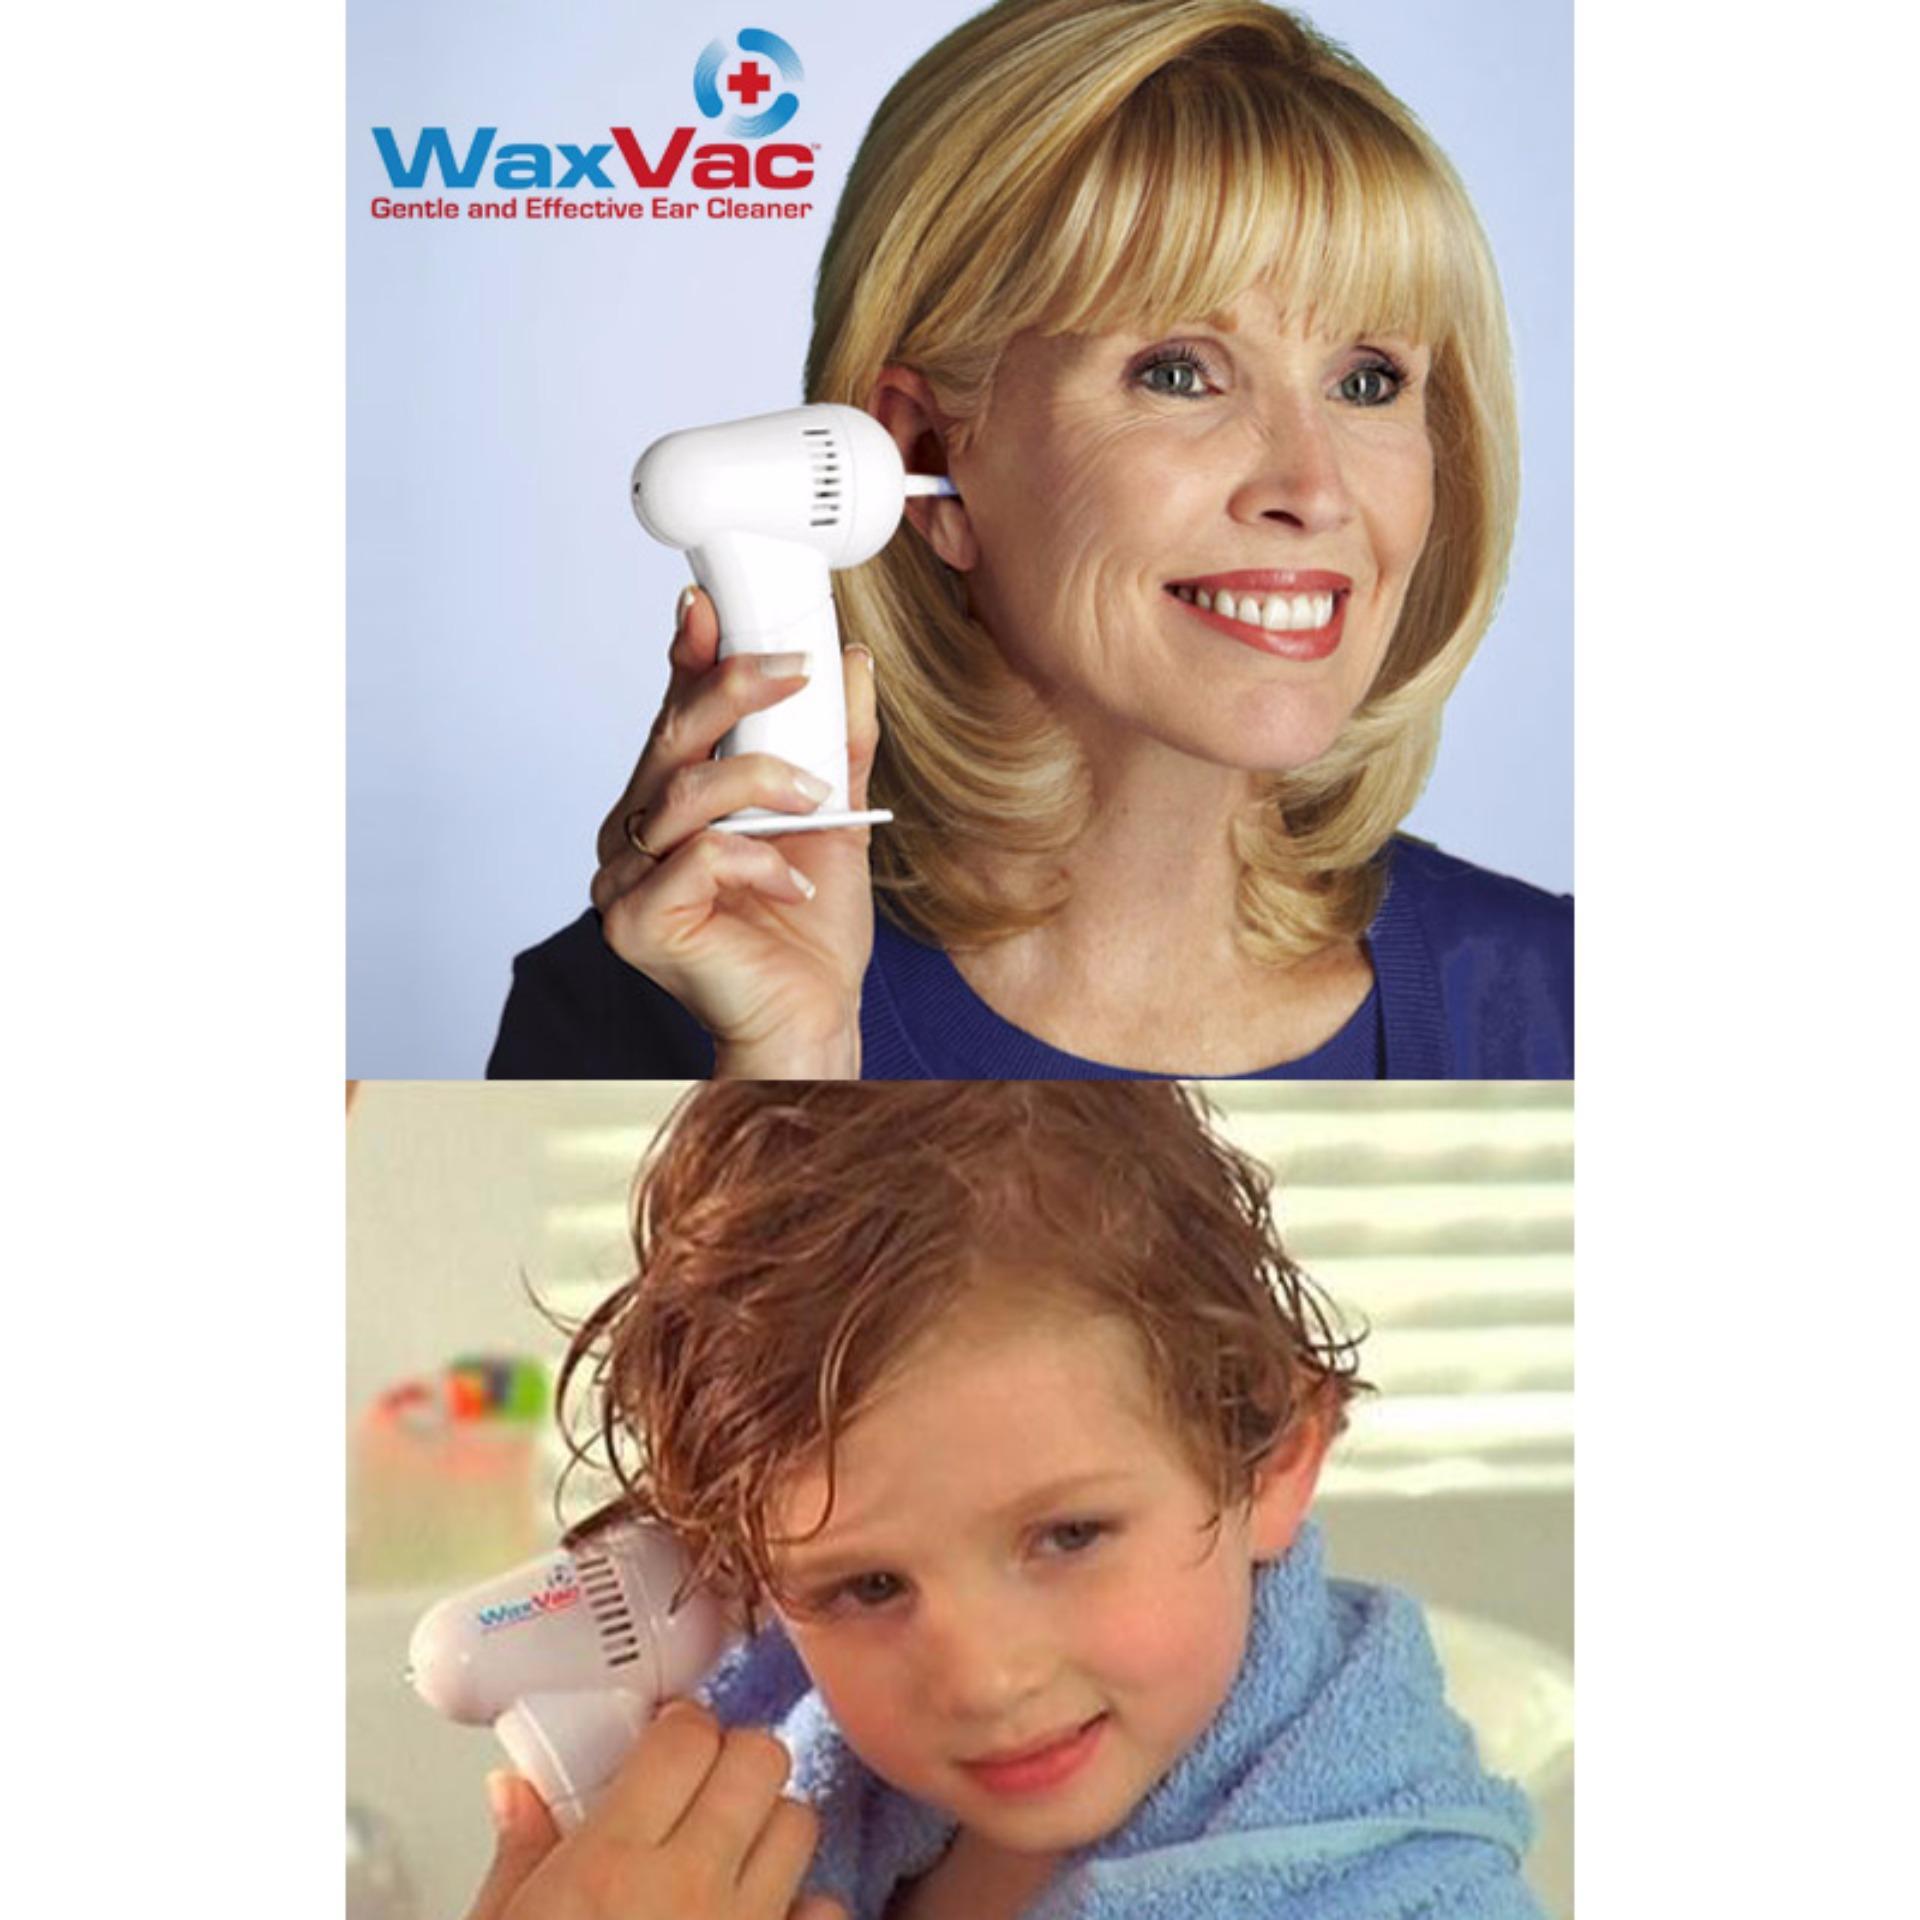 Anggaran Terbaik Alat Pembersih Telinga Wax Vac Praktis Aman Dan Electric Ear Vacuum Removal Whit Tidak Menyebabkan Luka